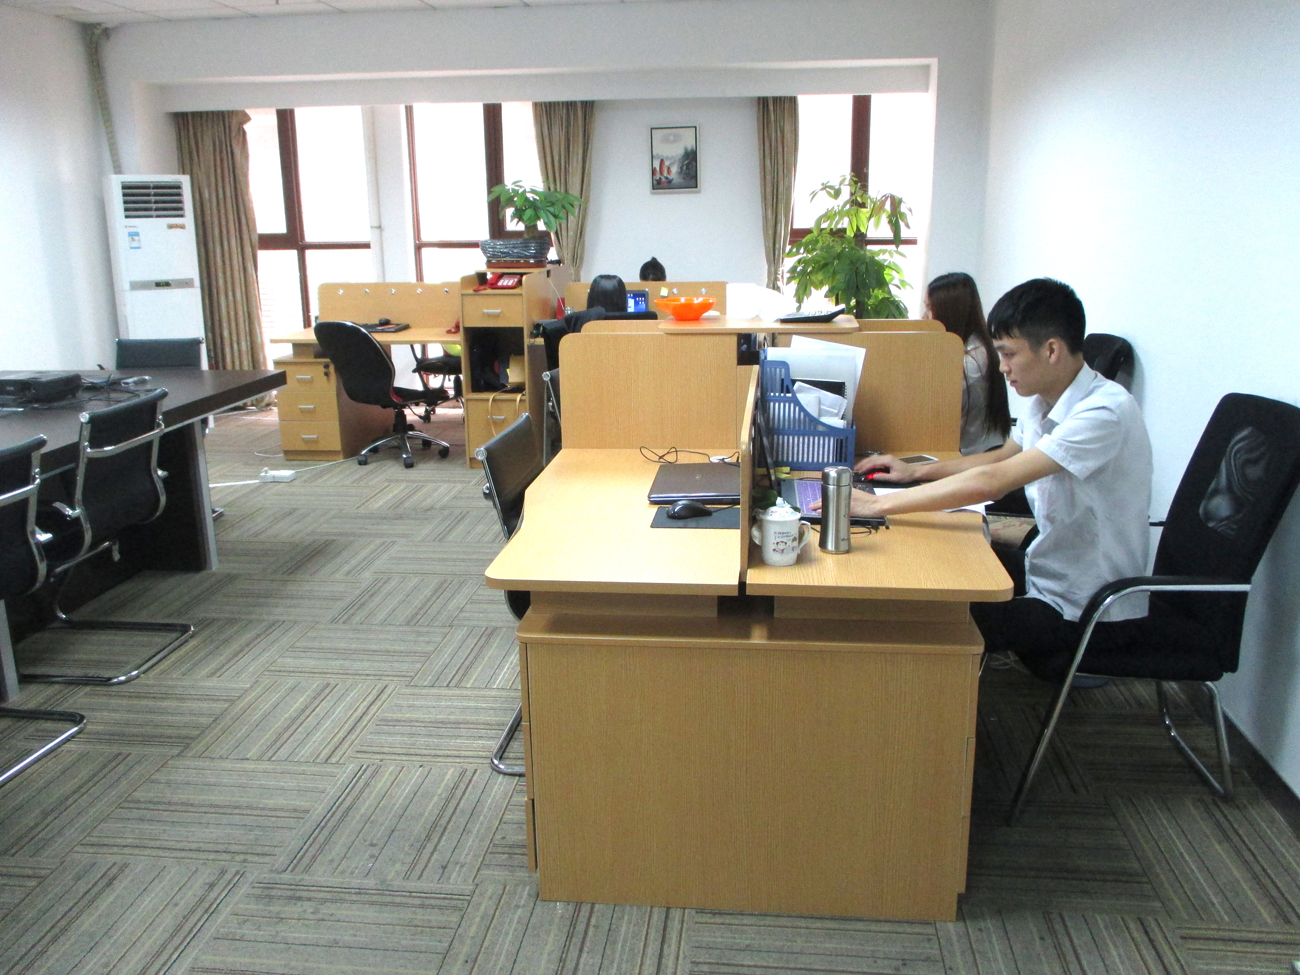 公司办公设施